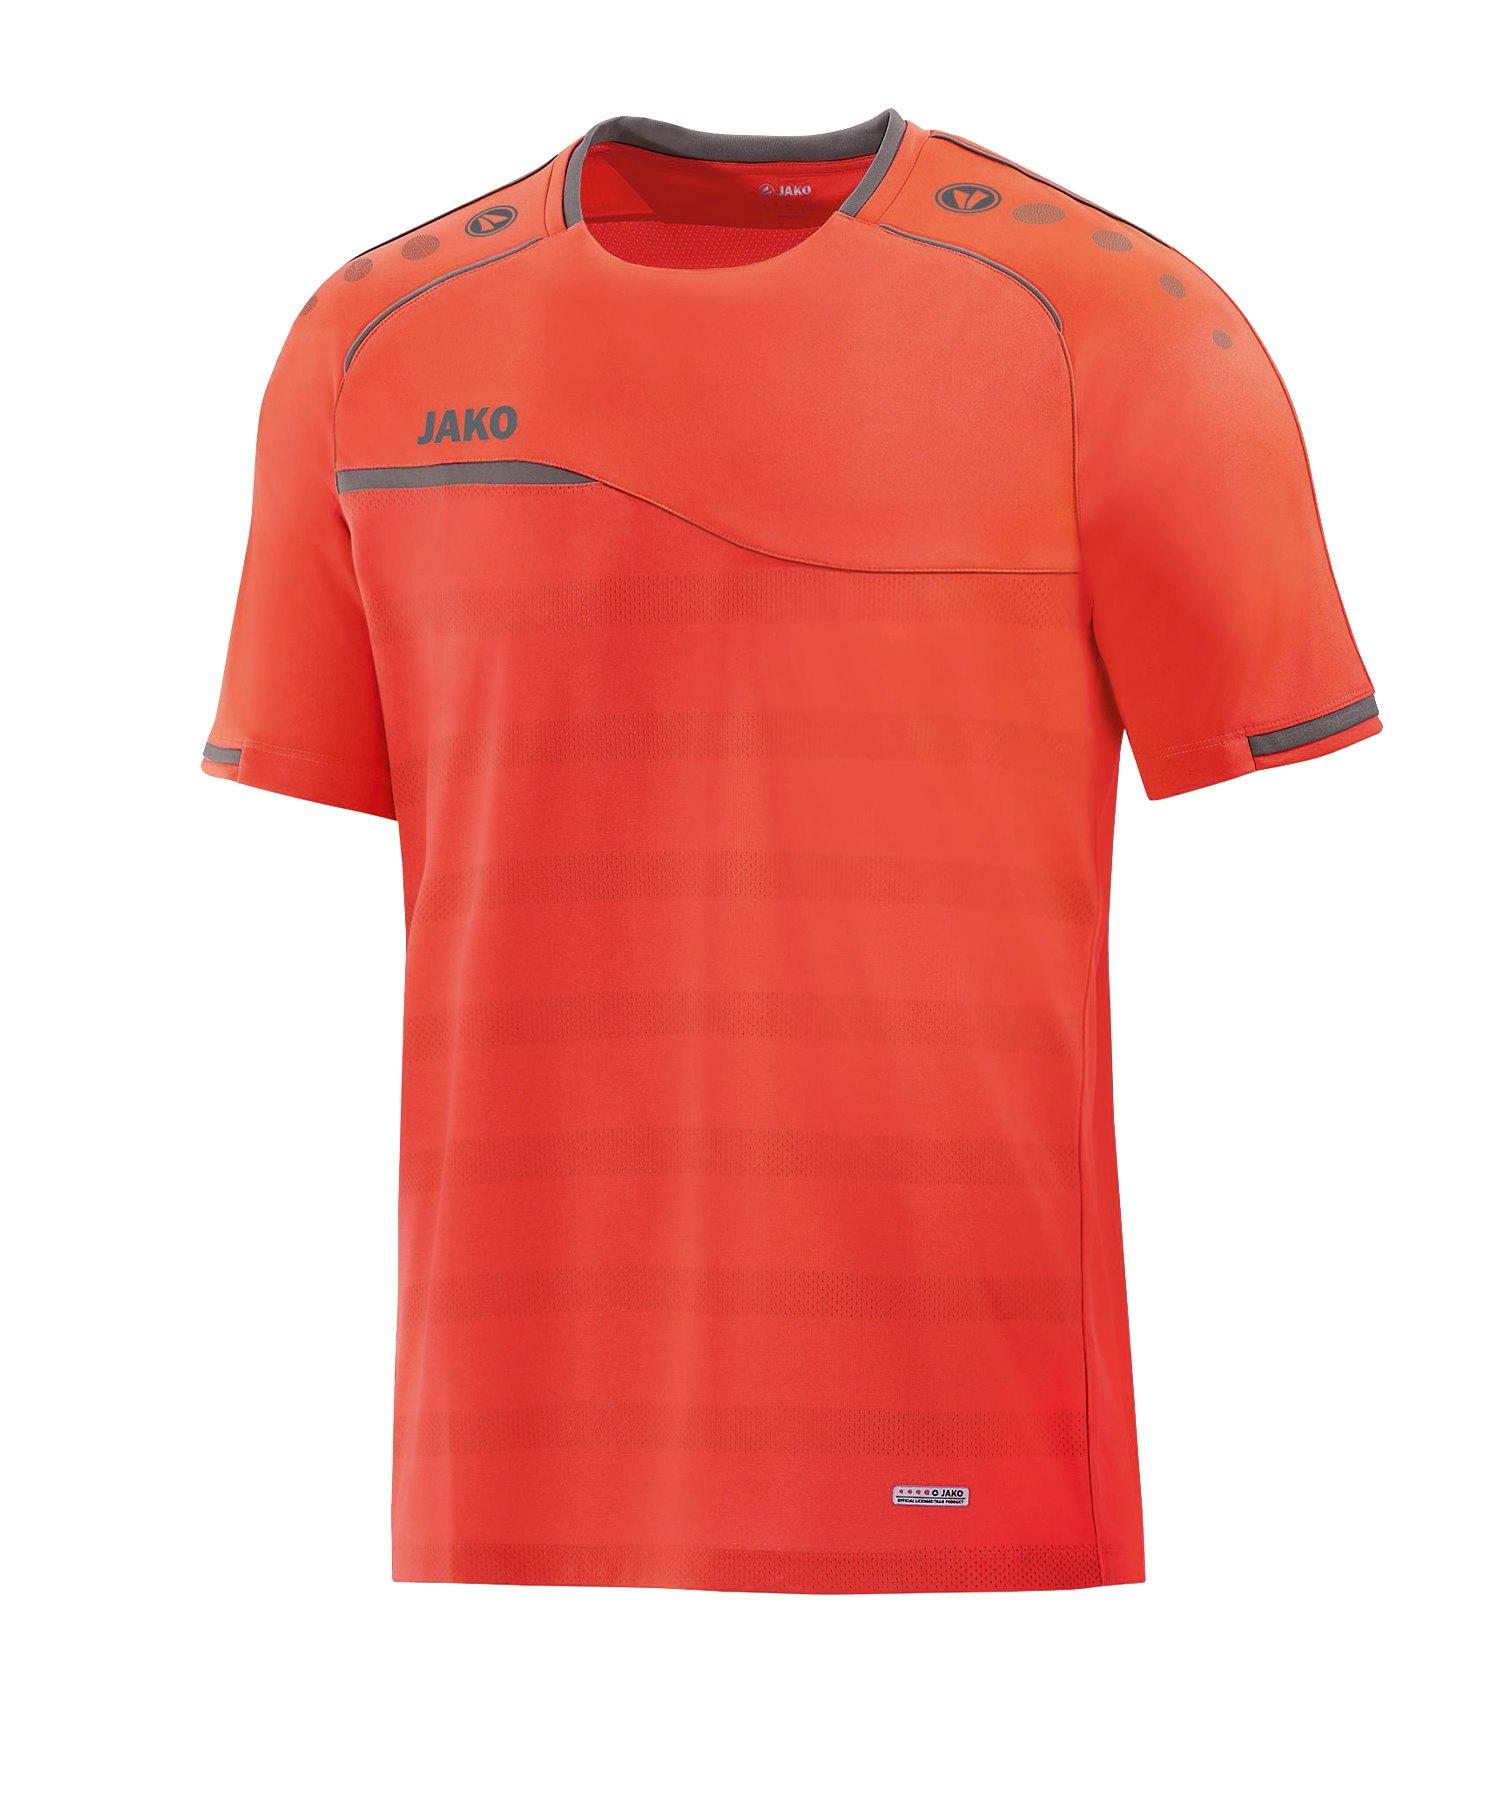 Jako Prestige T-Shirt Kids Orange Grau F40 - orange